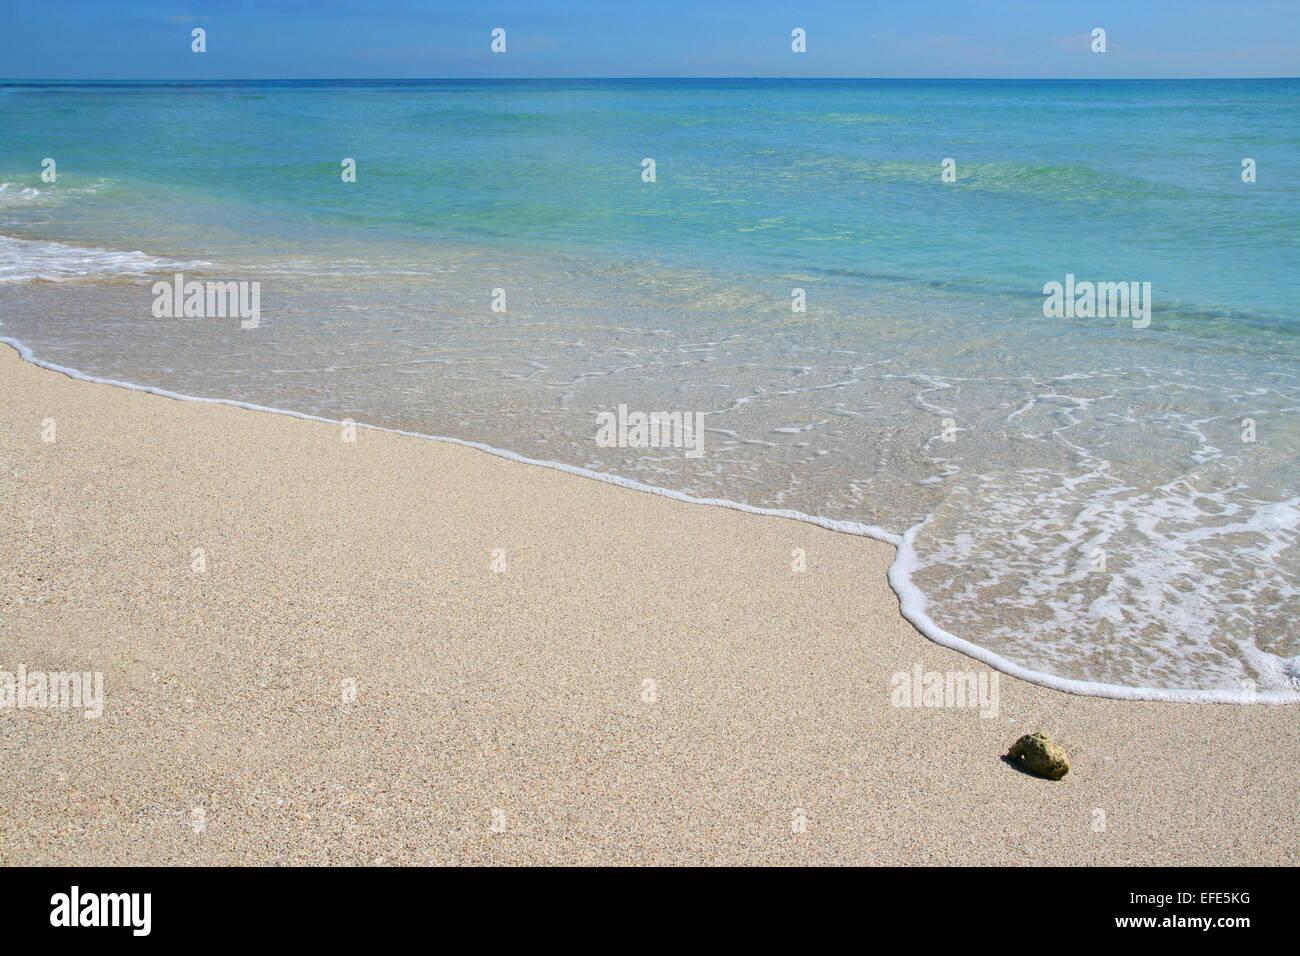 Traumstrand Miami - Stock Image